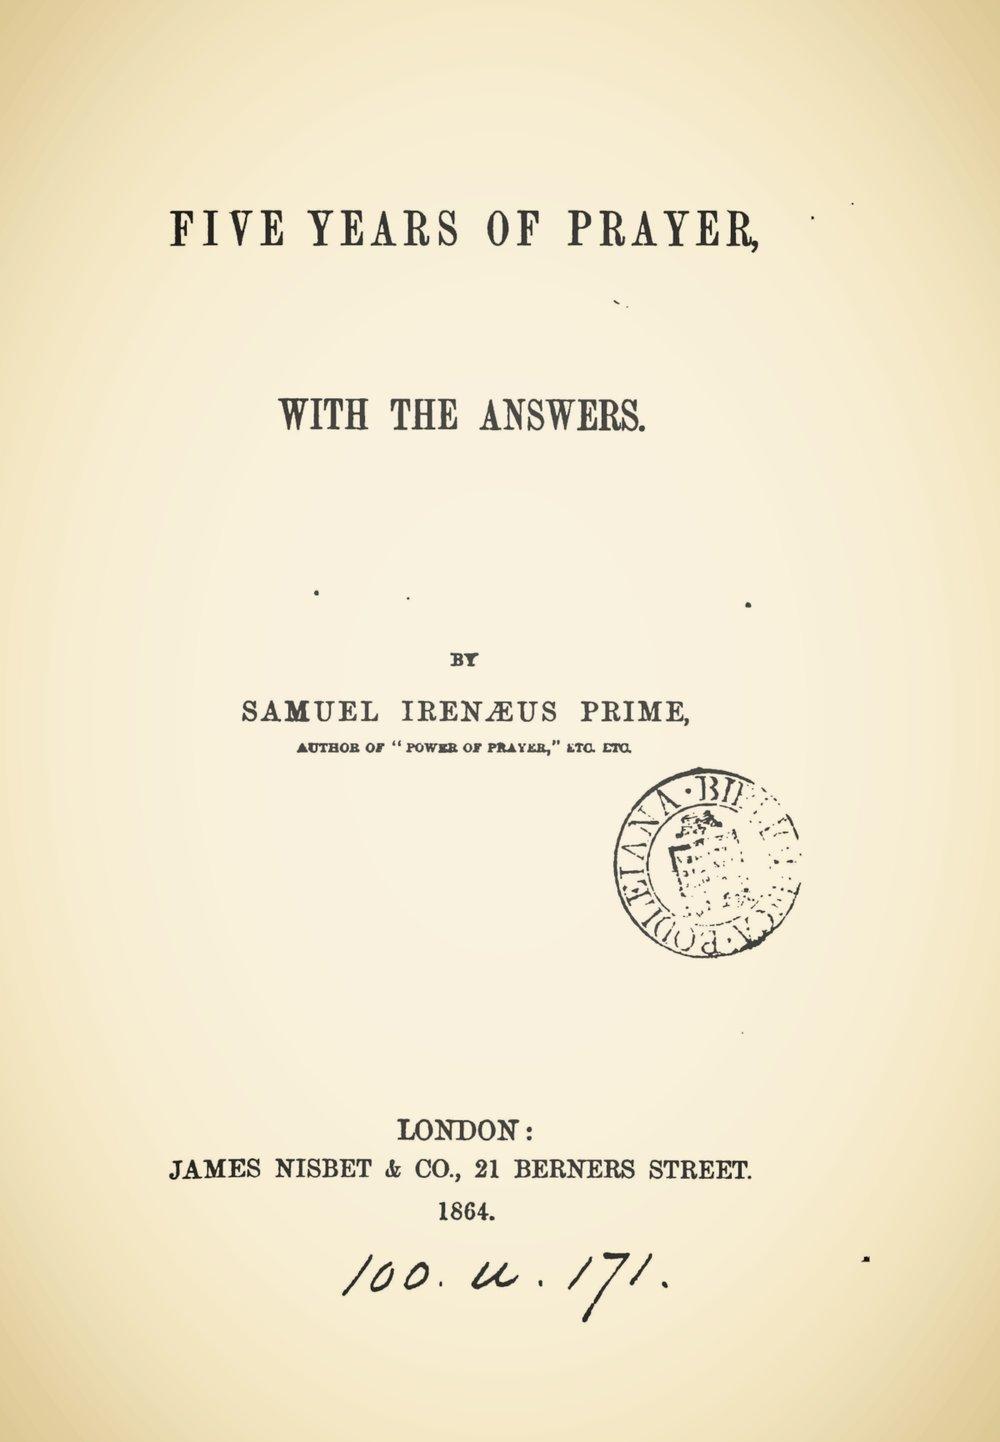 Prime, Samuel Irenaeus, Five Years of Prayer Title Page.jpg